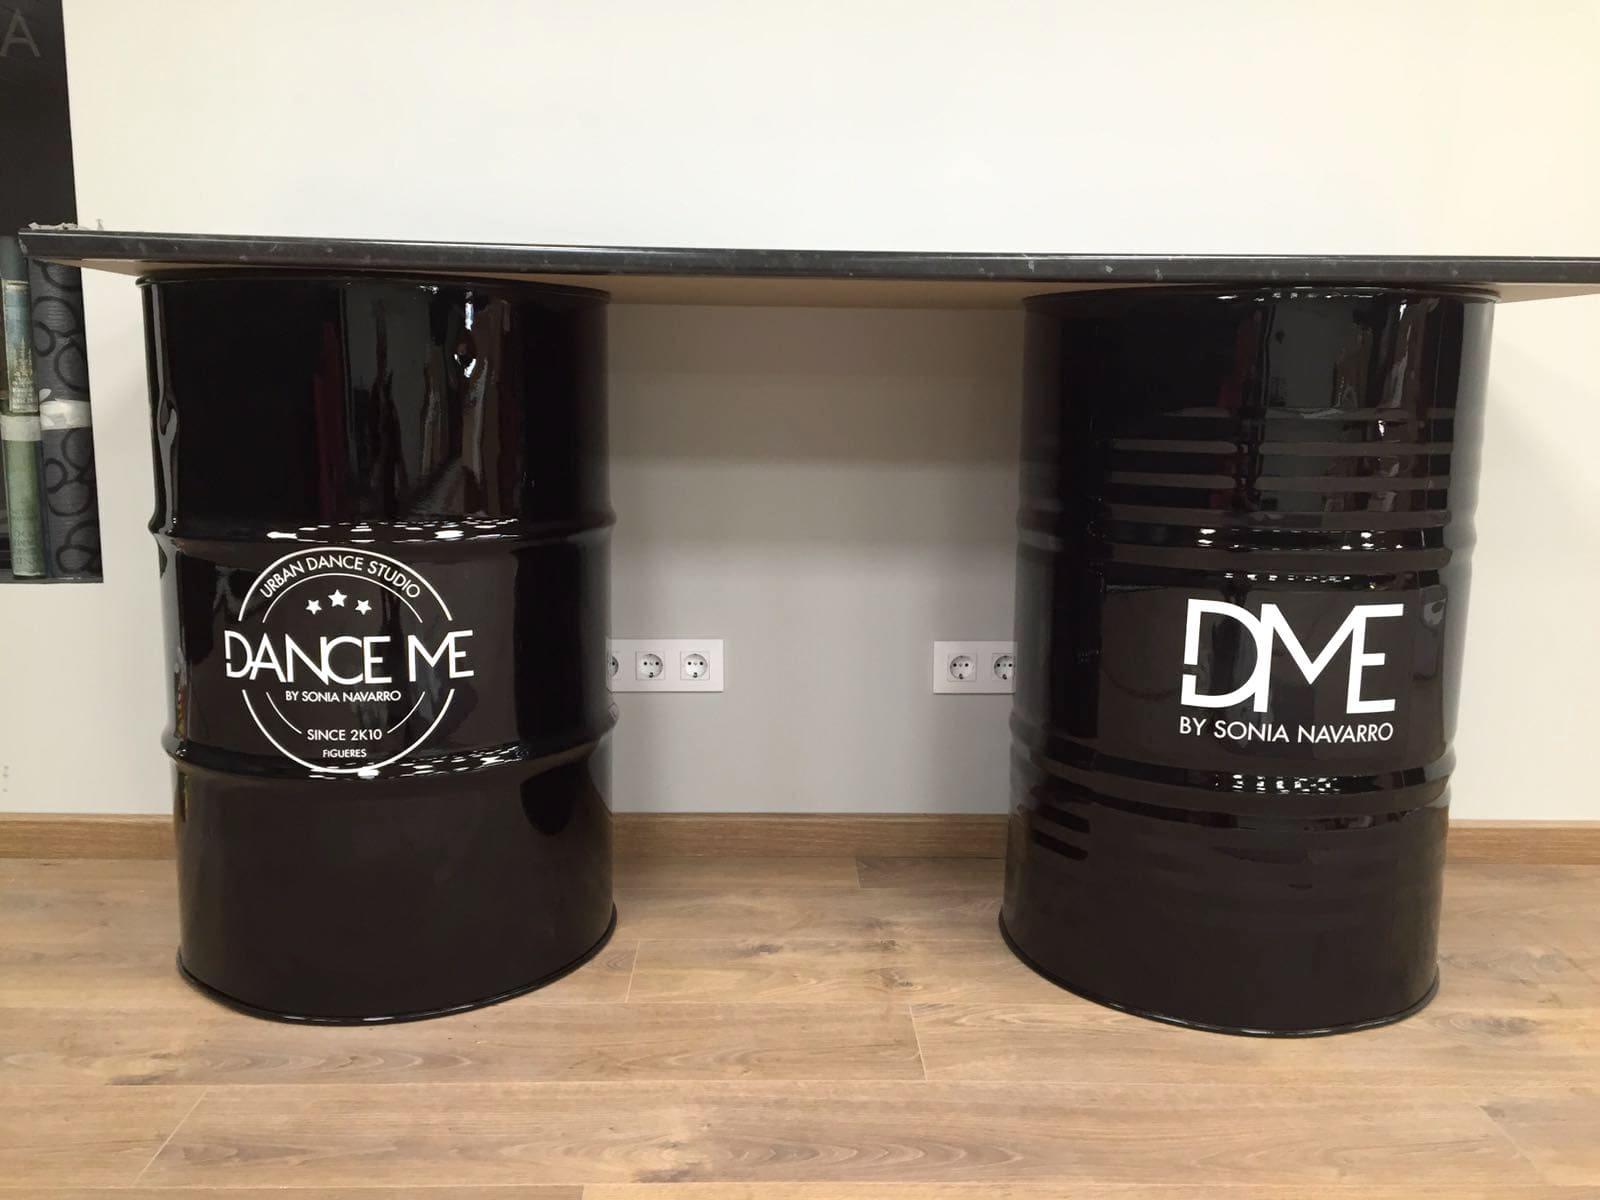 DANCEME4 - DANCEME4